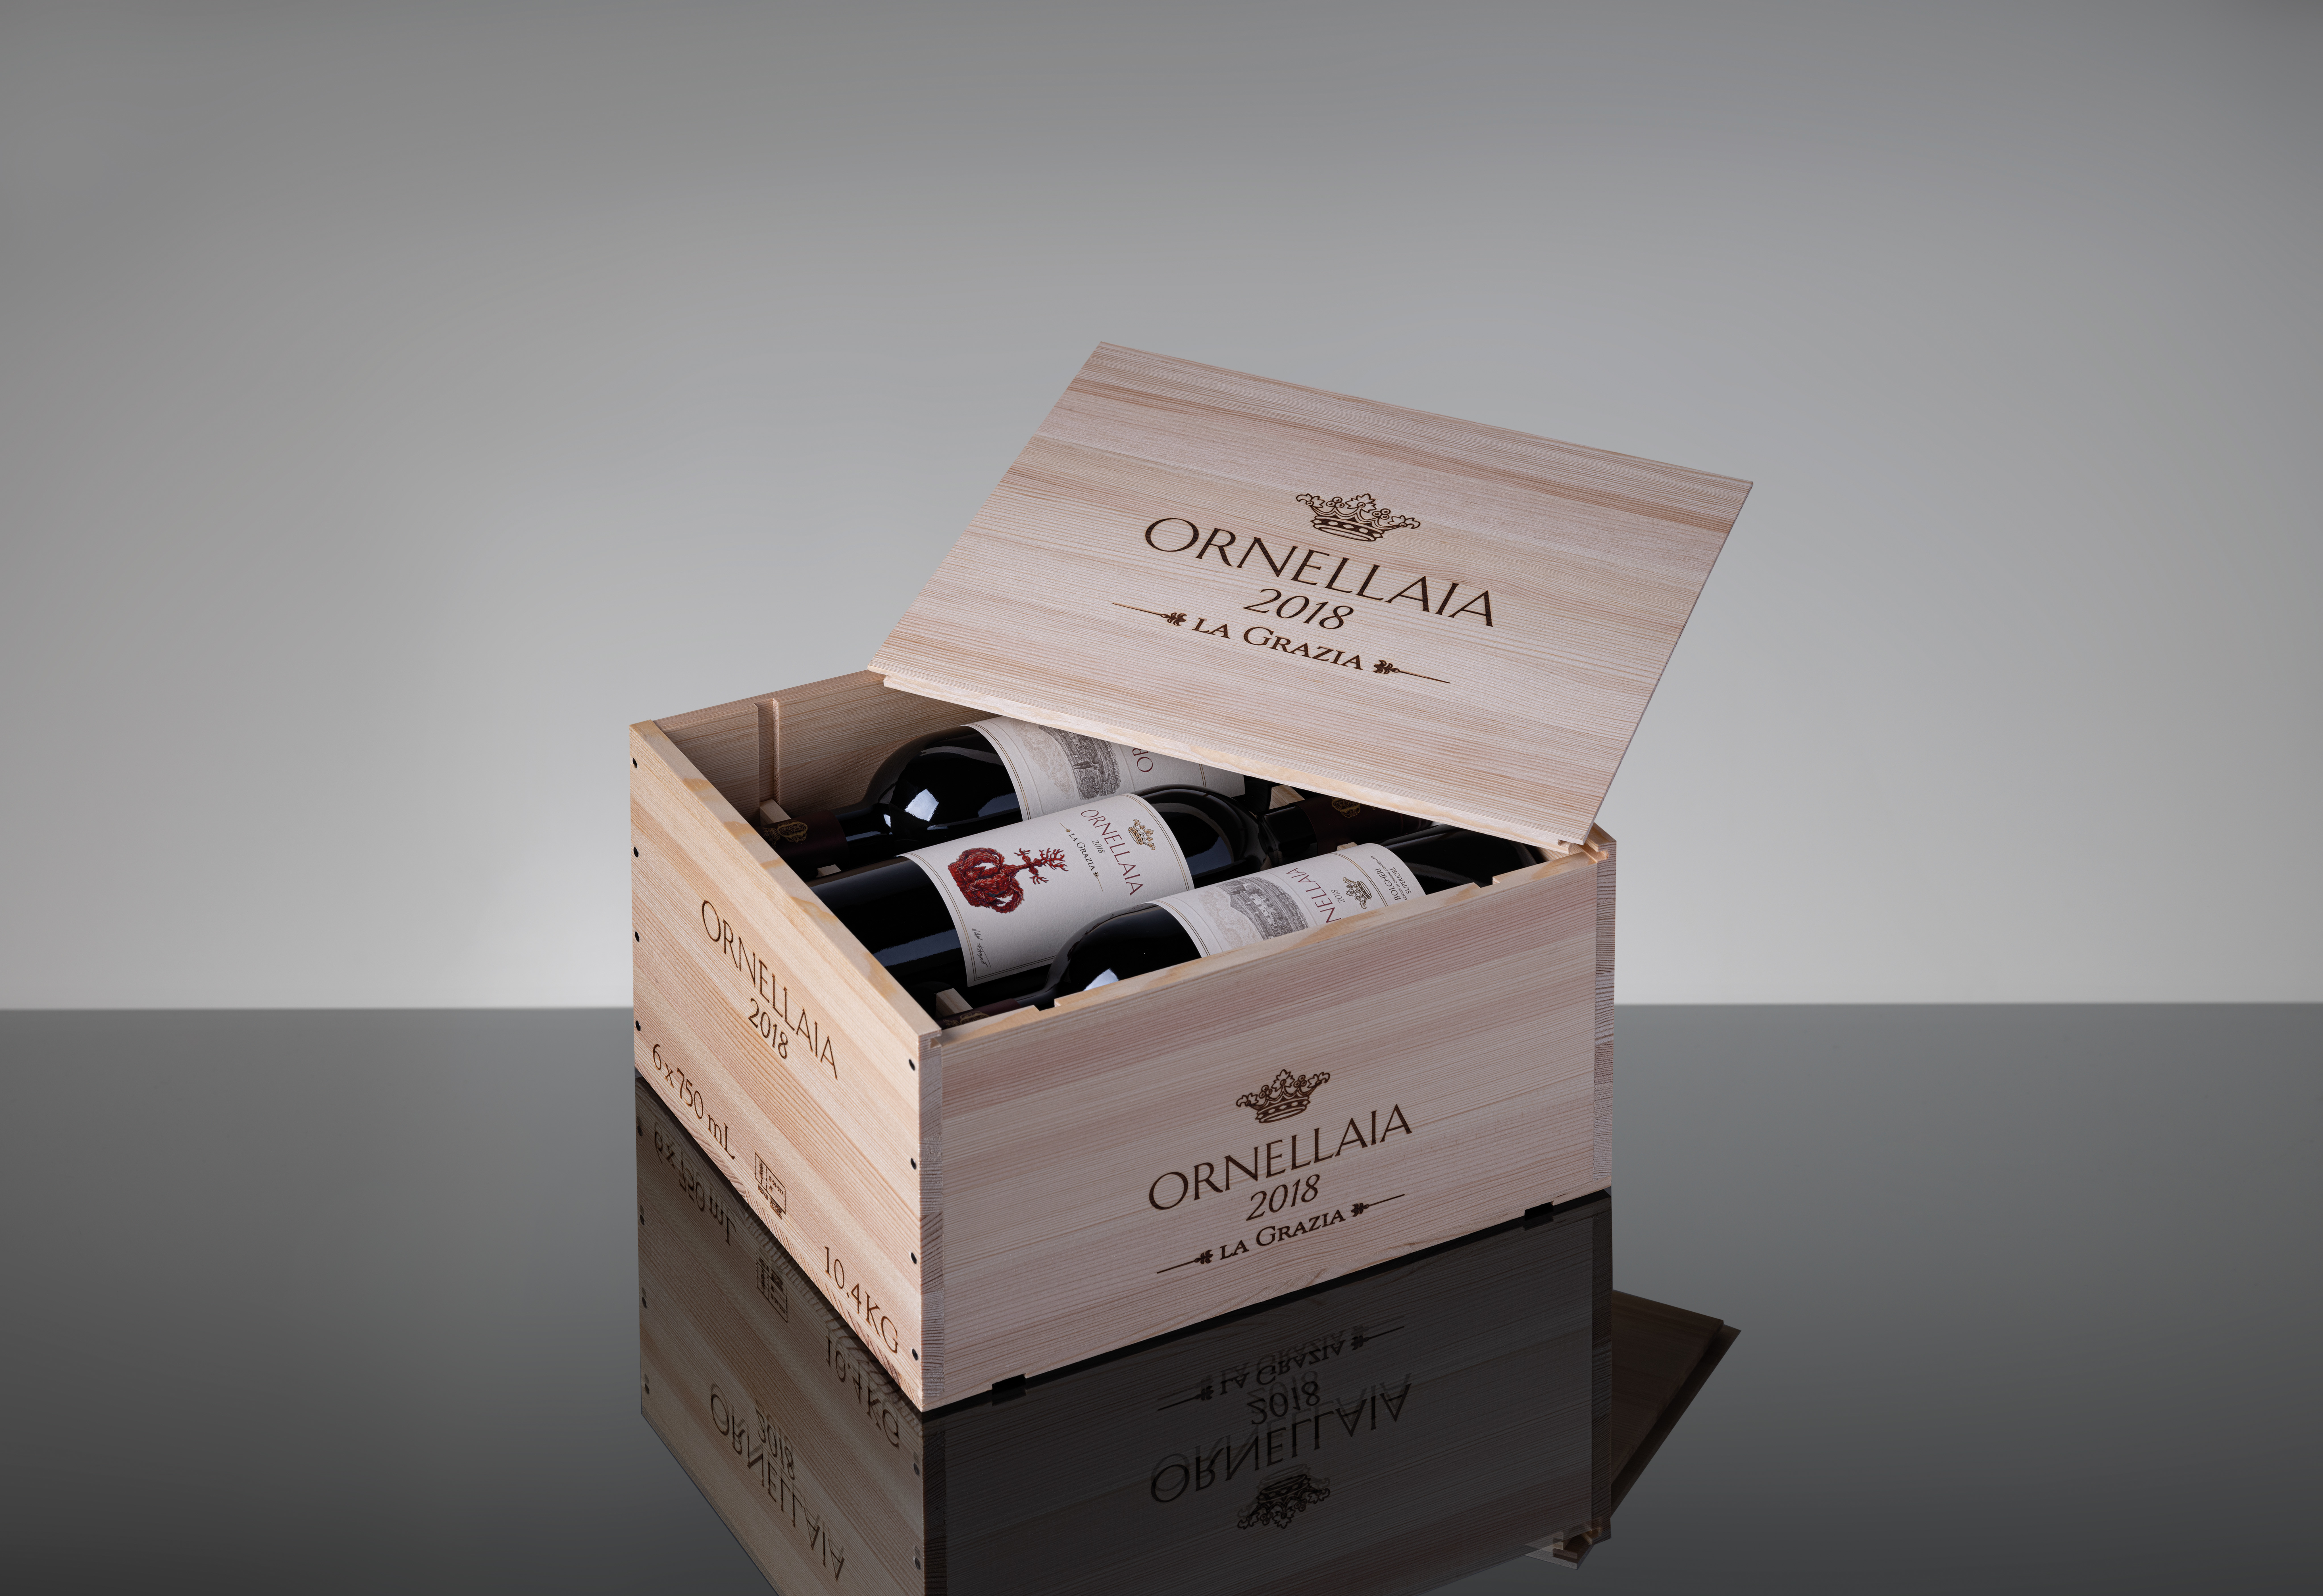 0,75l Ornellaia 2018 Case - Beautyshot.jpg